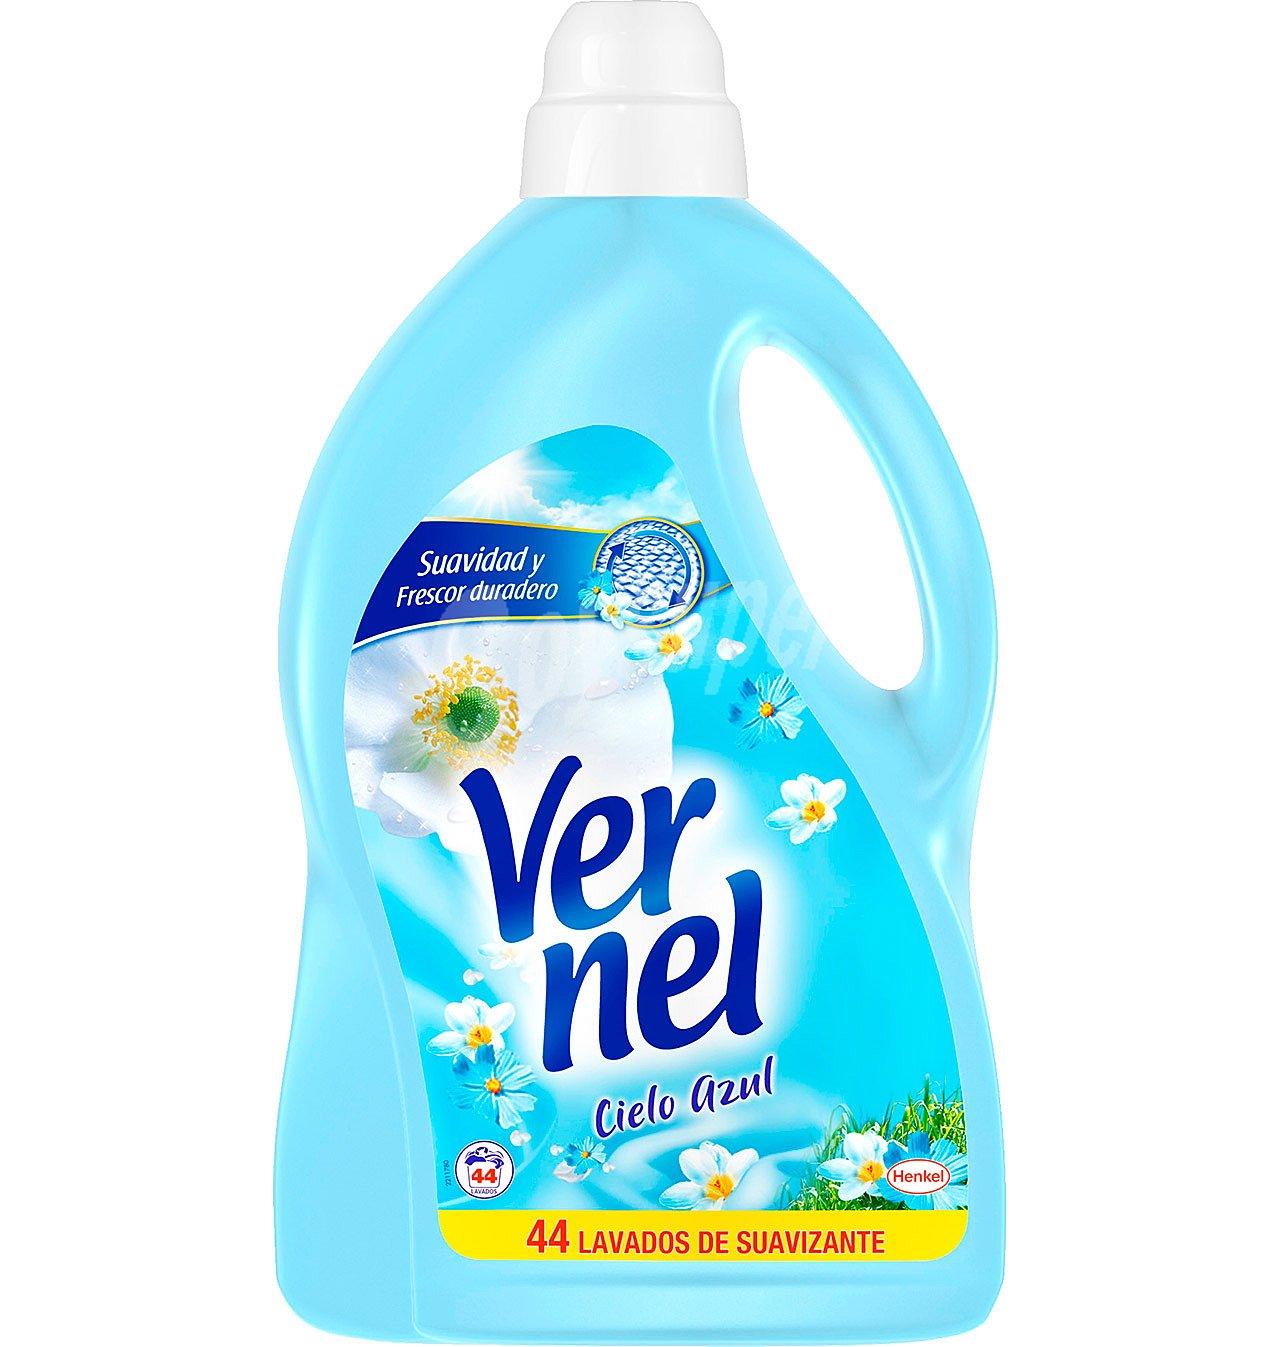 Suavizante Vernel Cielo Azul44 lavados